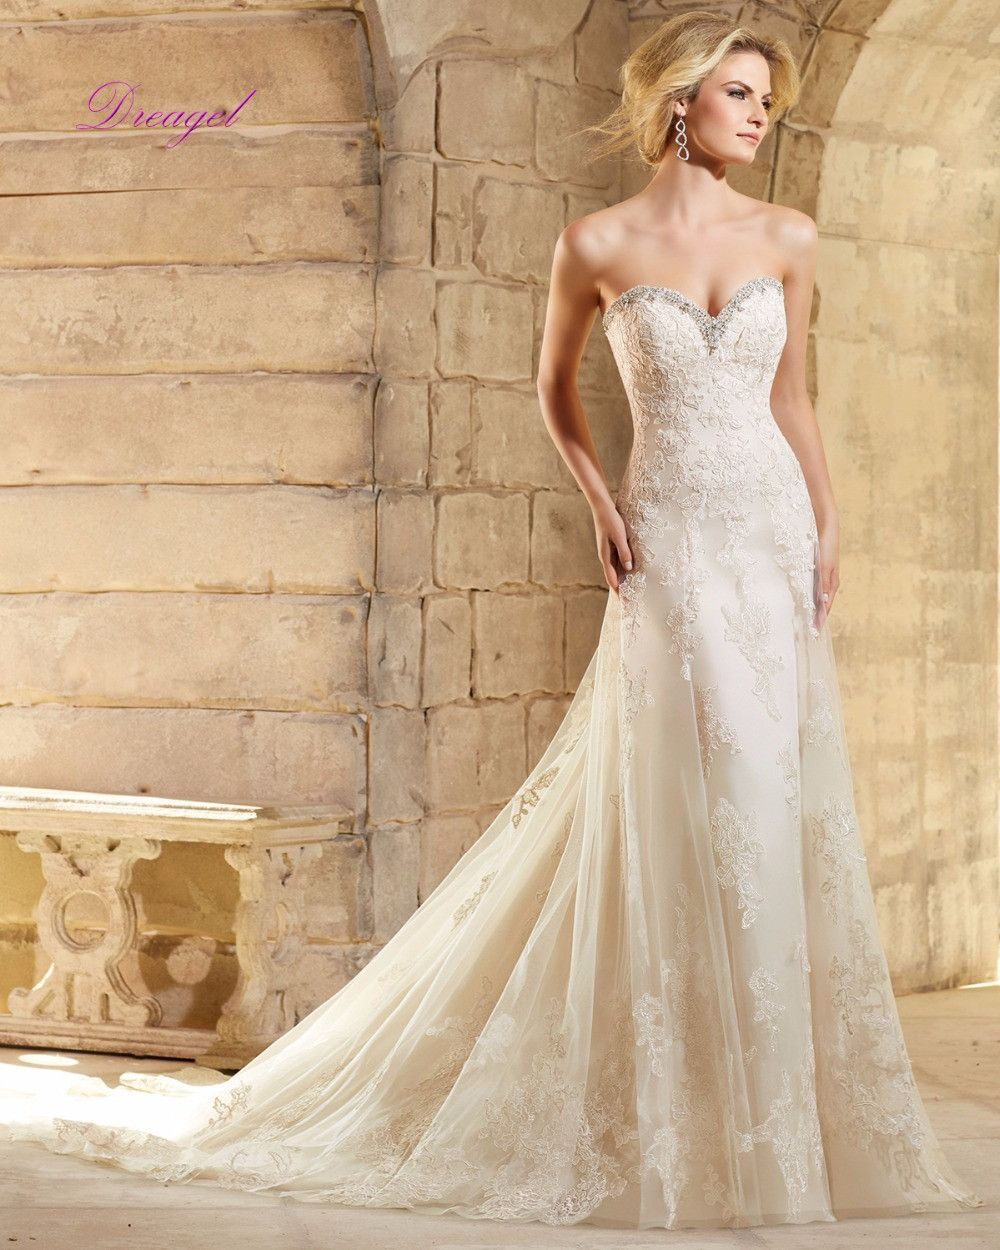 Dreagel New Desiger Luxury Beaded Strapless Trumpet Wedding Dress 2017 Exquisite Appliques Mermaid Gown Vestido